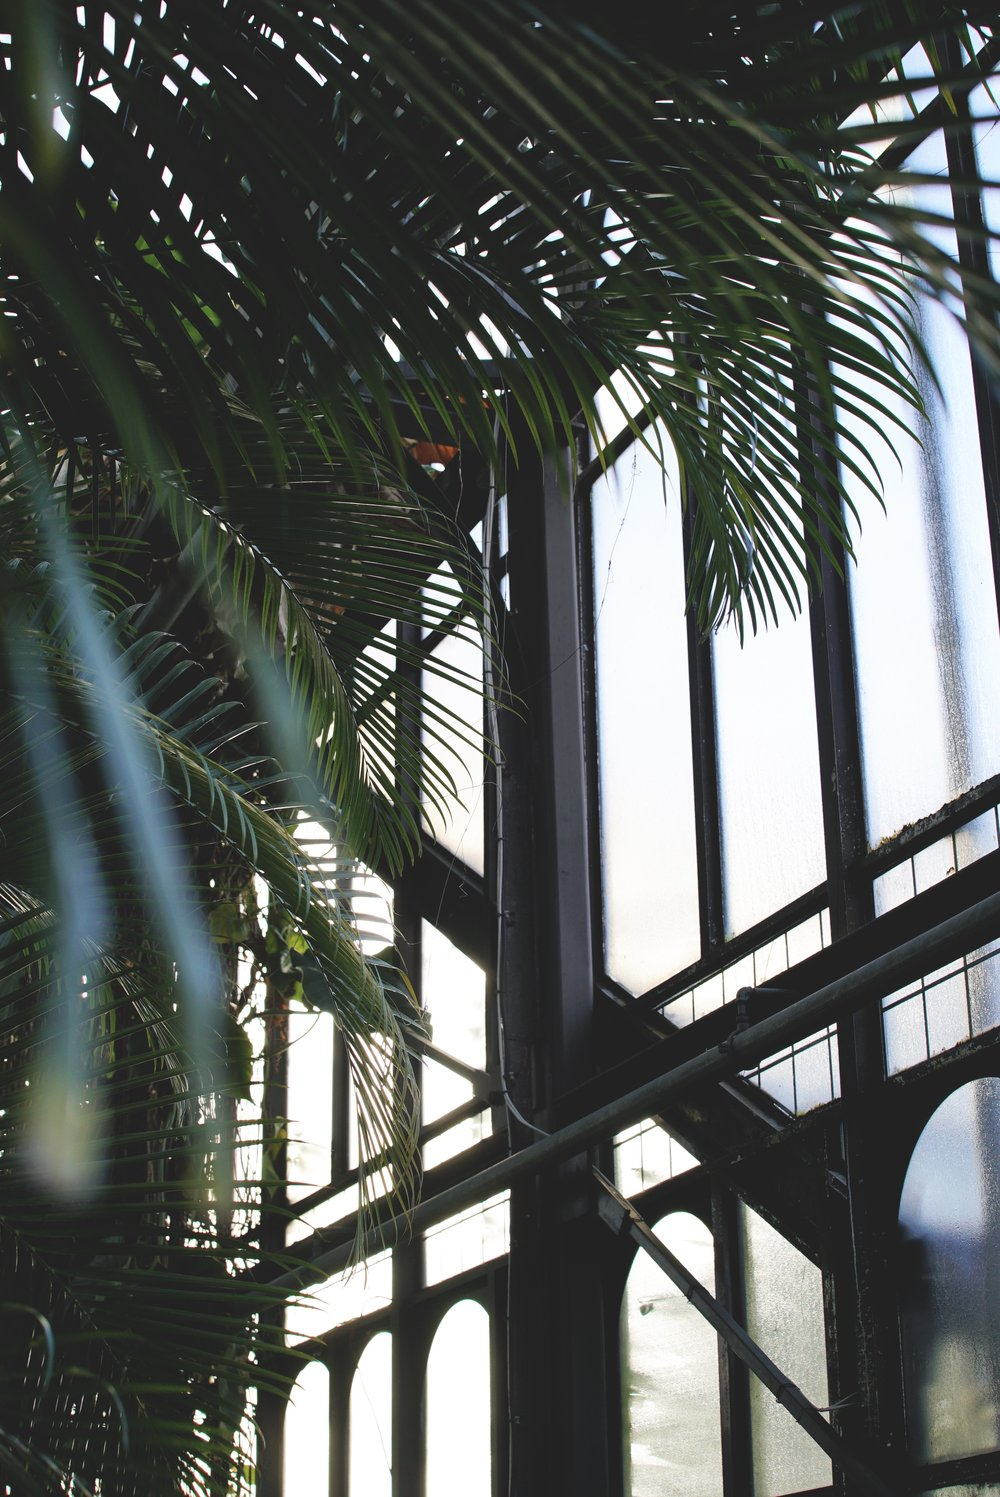 Glasgow Botanics Greenhouse